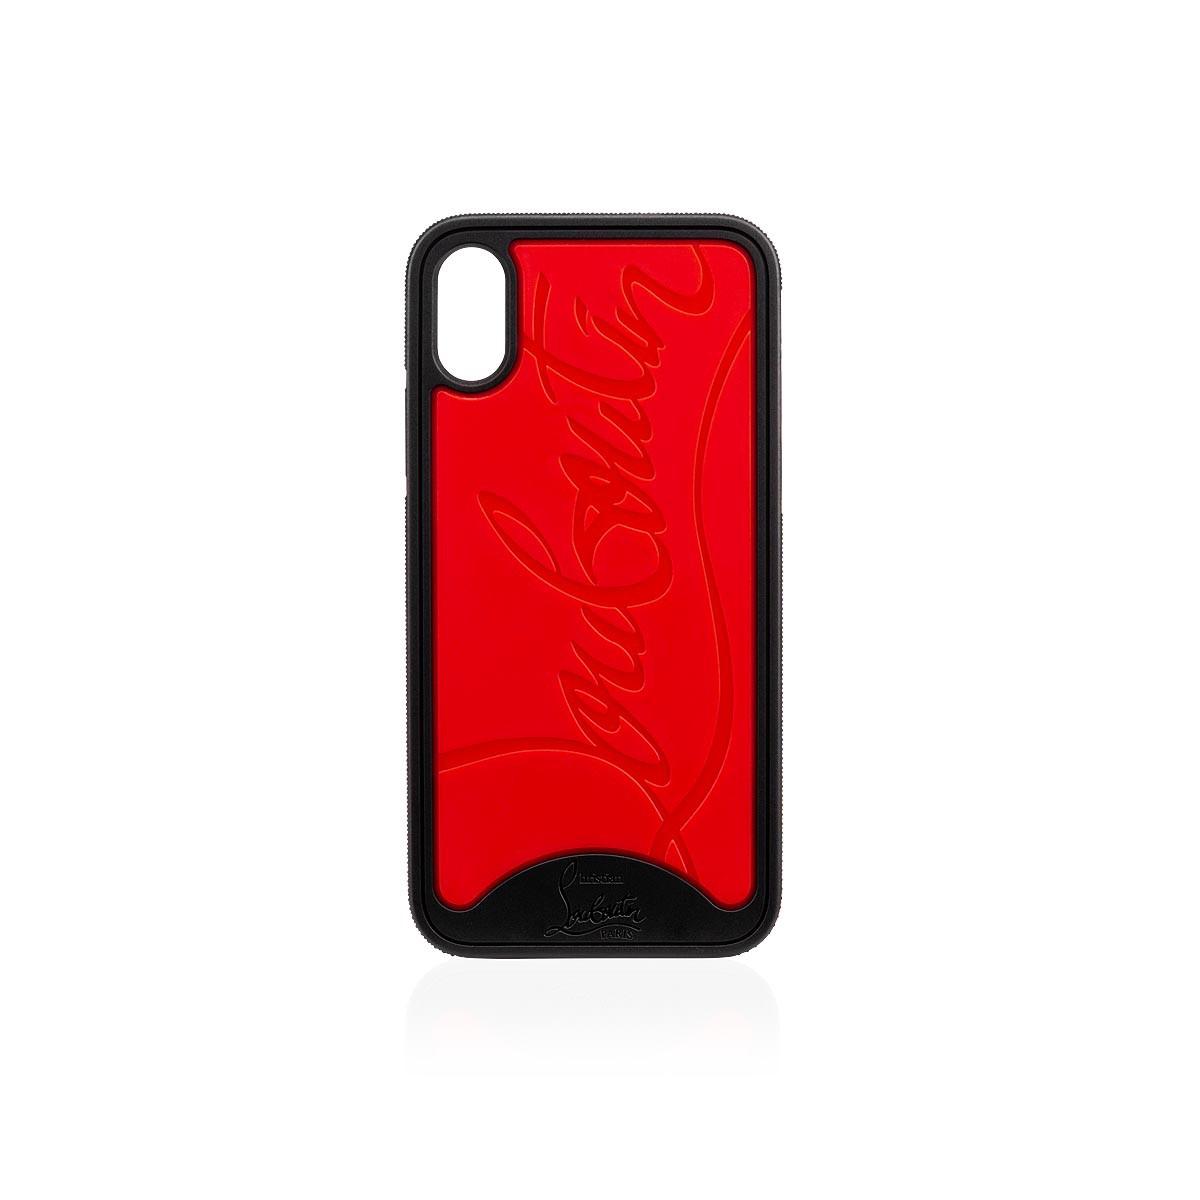 7ac6bcb080b Loubiphone X BLACK-RED Rubber - Accessories - Christian Louboutin